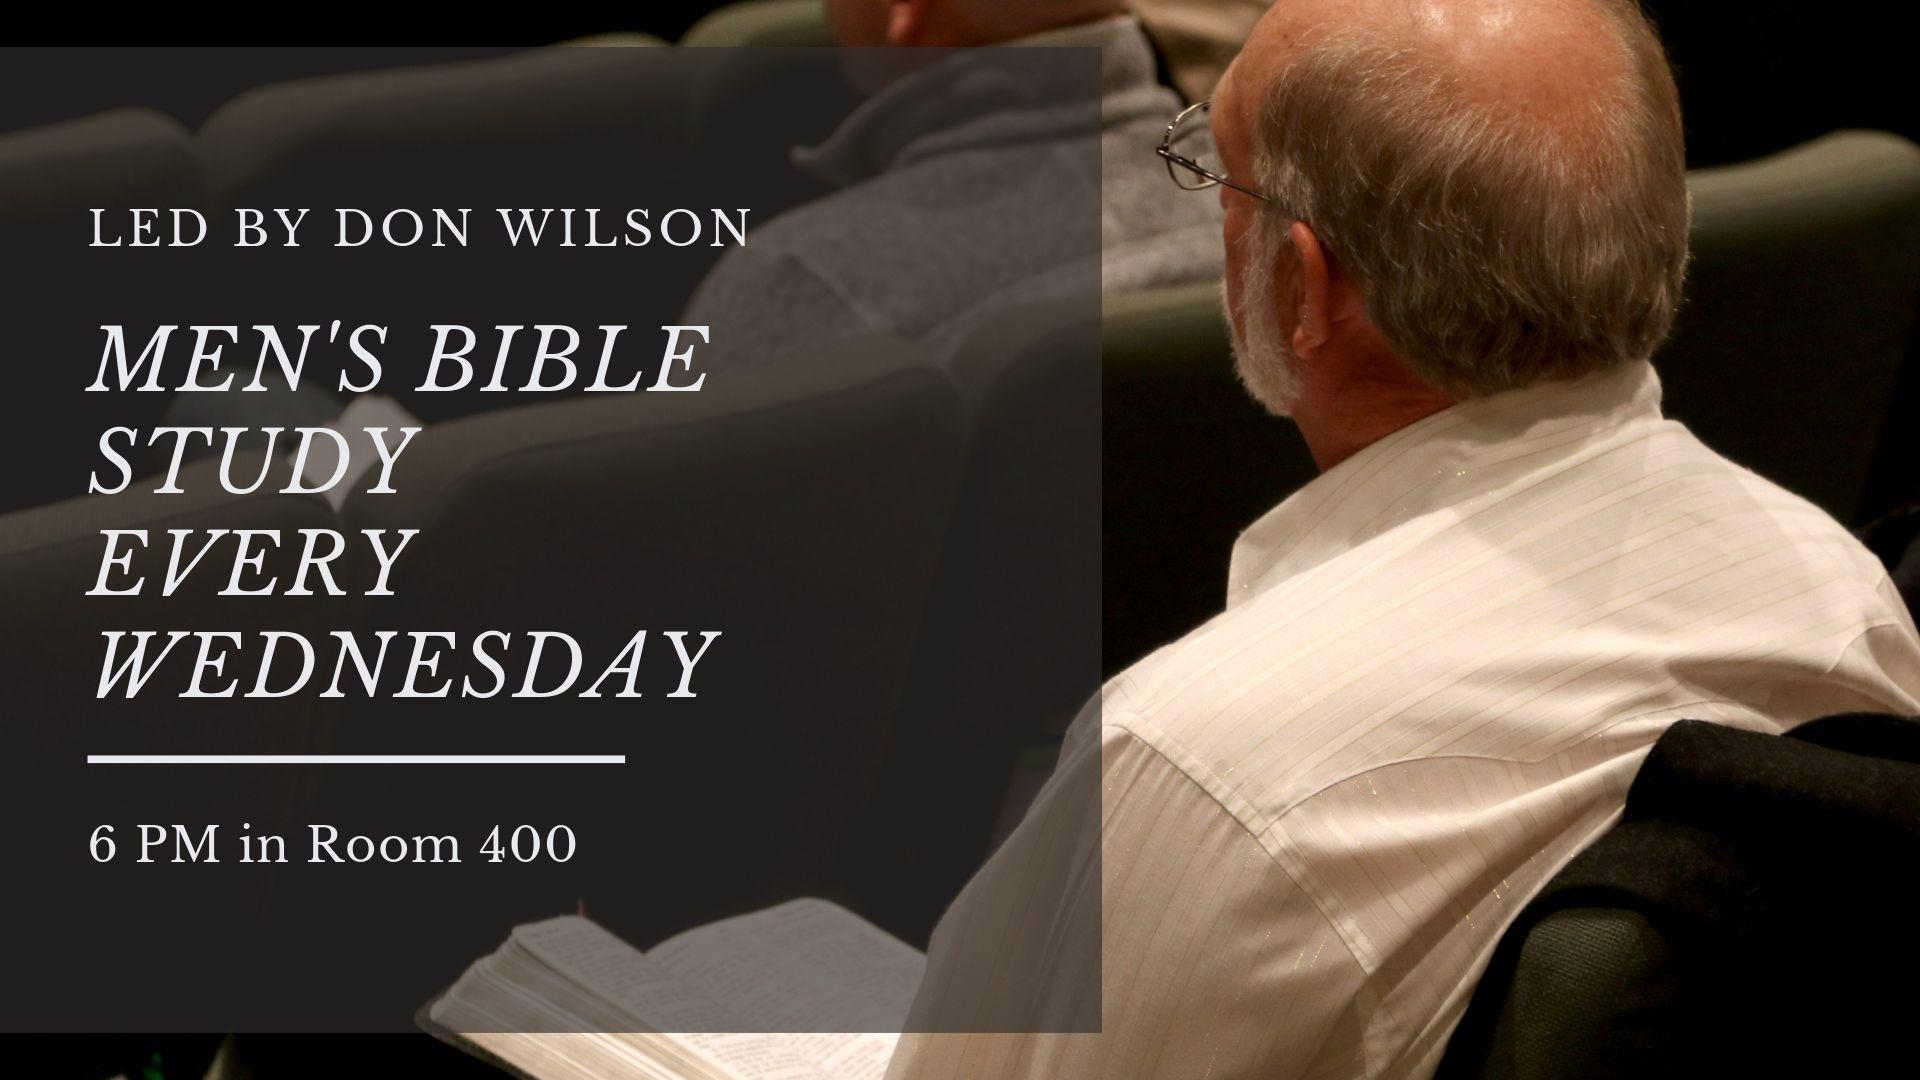 Men's Bible Study Every Wednesday (1).jpg